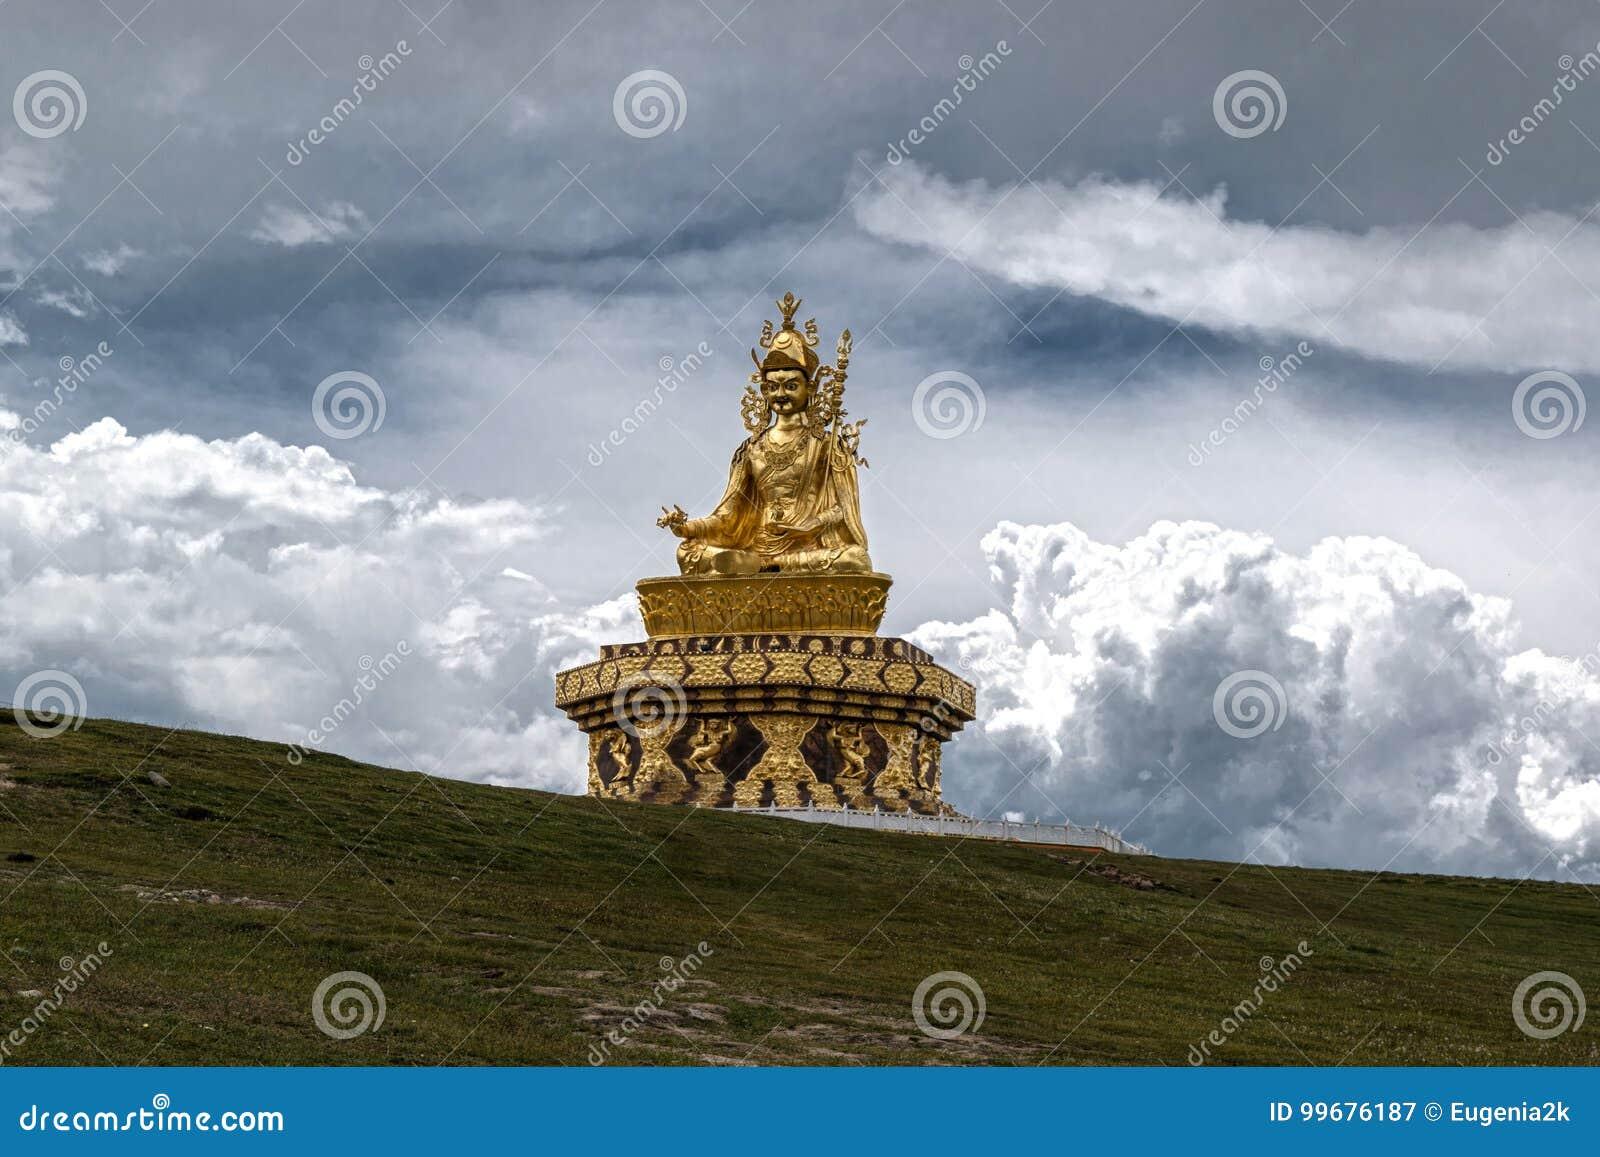 Guru Rimpoche Statue